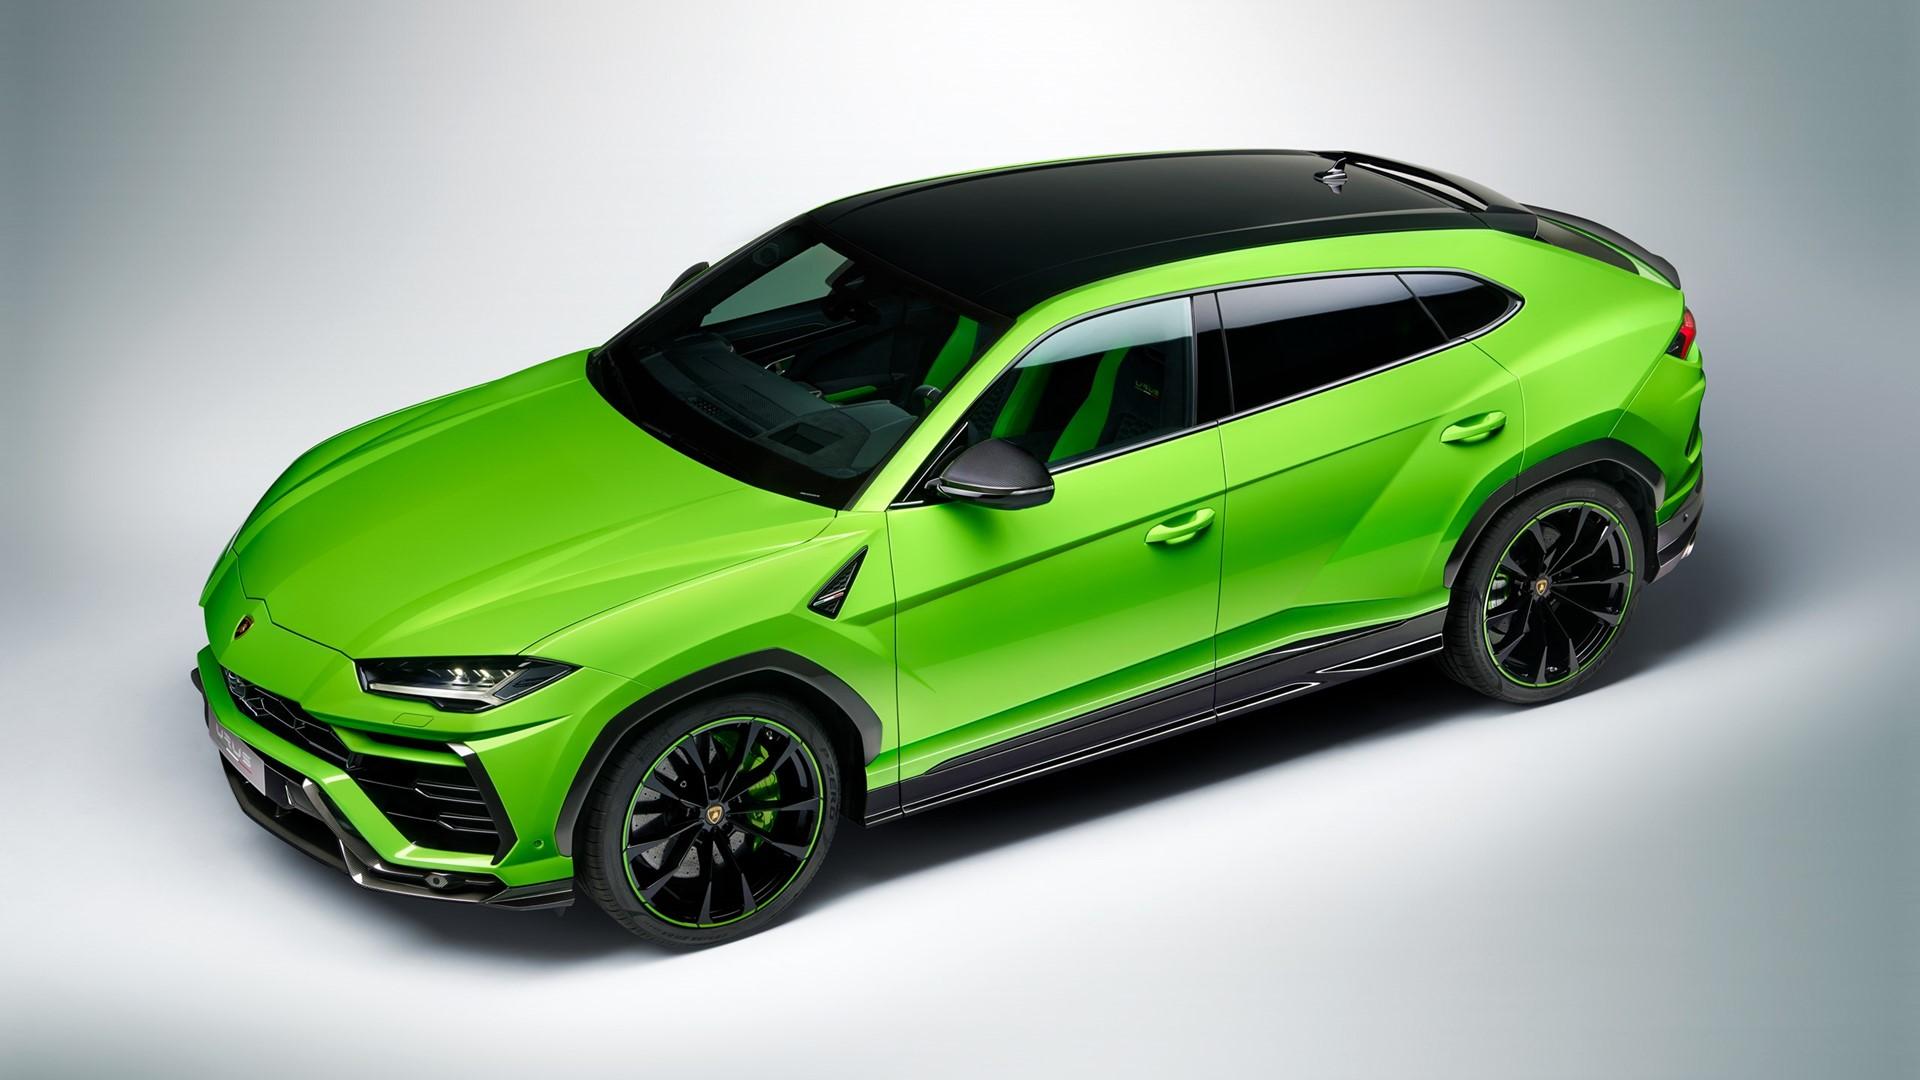 Automobili Lamborghini Presents The Urus Pearl Capsule Unlocking New Adventures In Color For The Lamborghini Urus